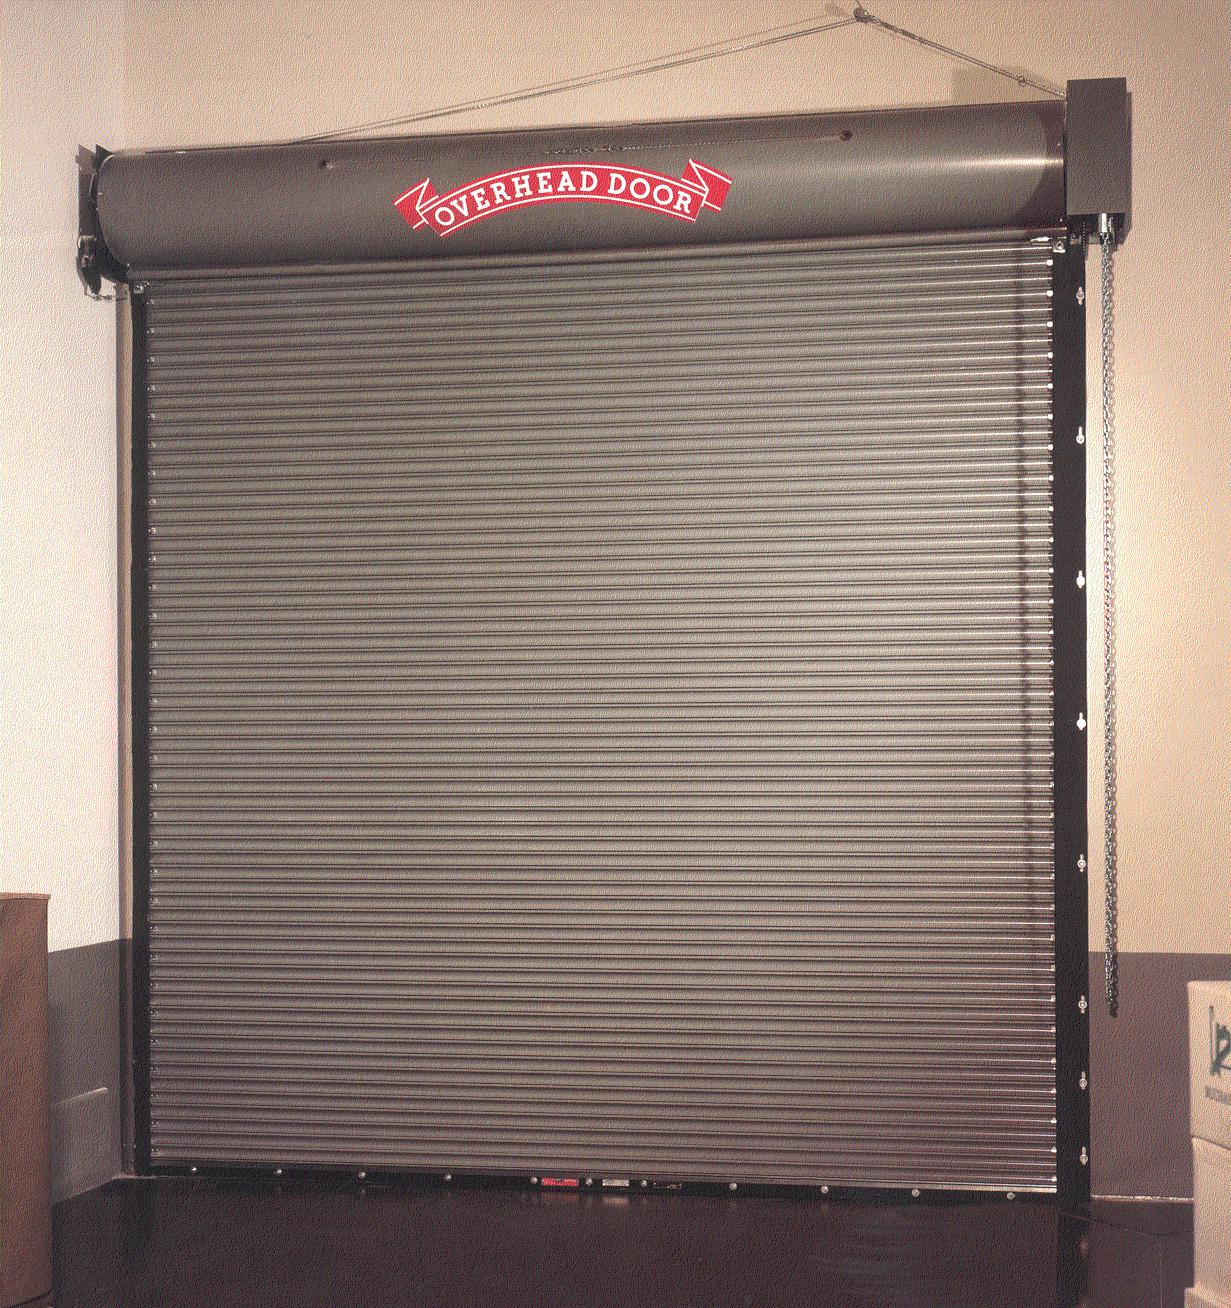 Detroit door hardware company in madison heights mi for Automatic garage door company minneapolis